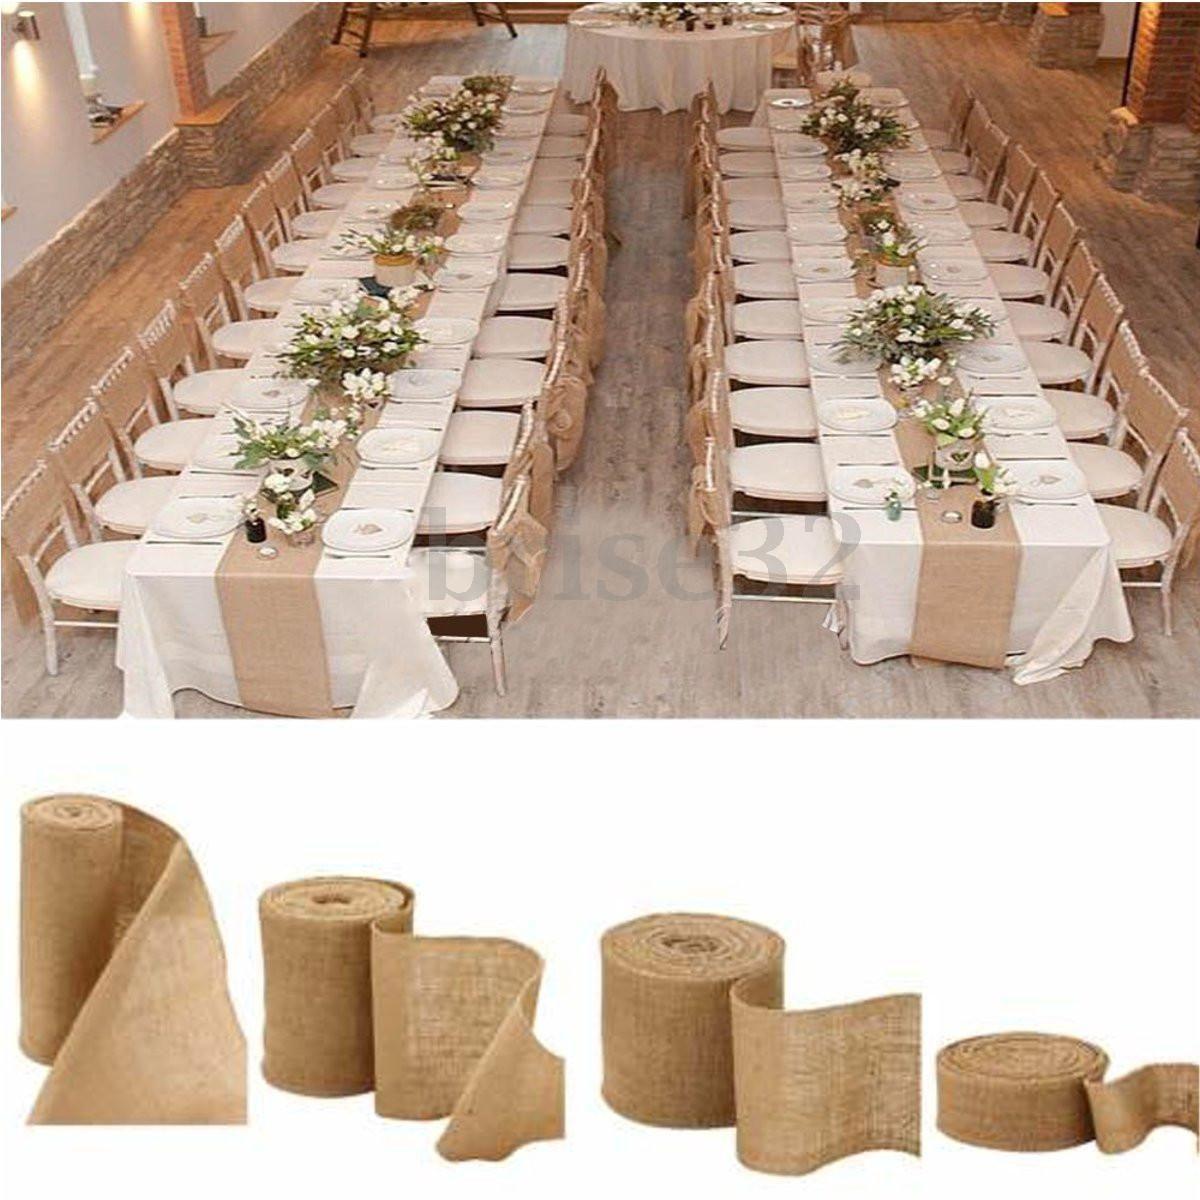 10m Vintage Table Runner Jute Burlap Hessian Ribbon Wedding Party Craft Decor Wedding Party Table Rustic Wedding Decor Wedding Table